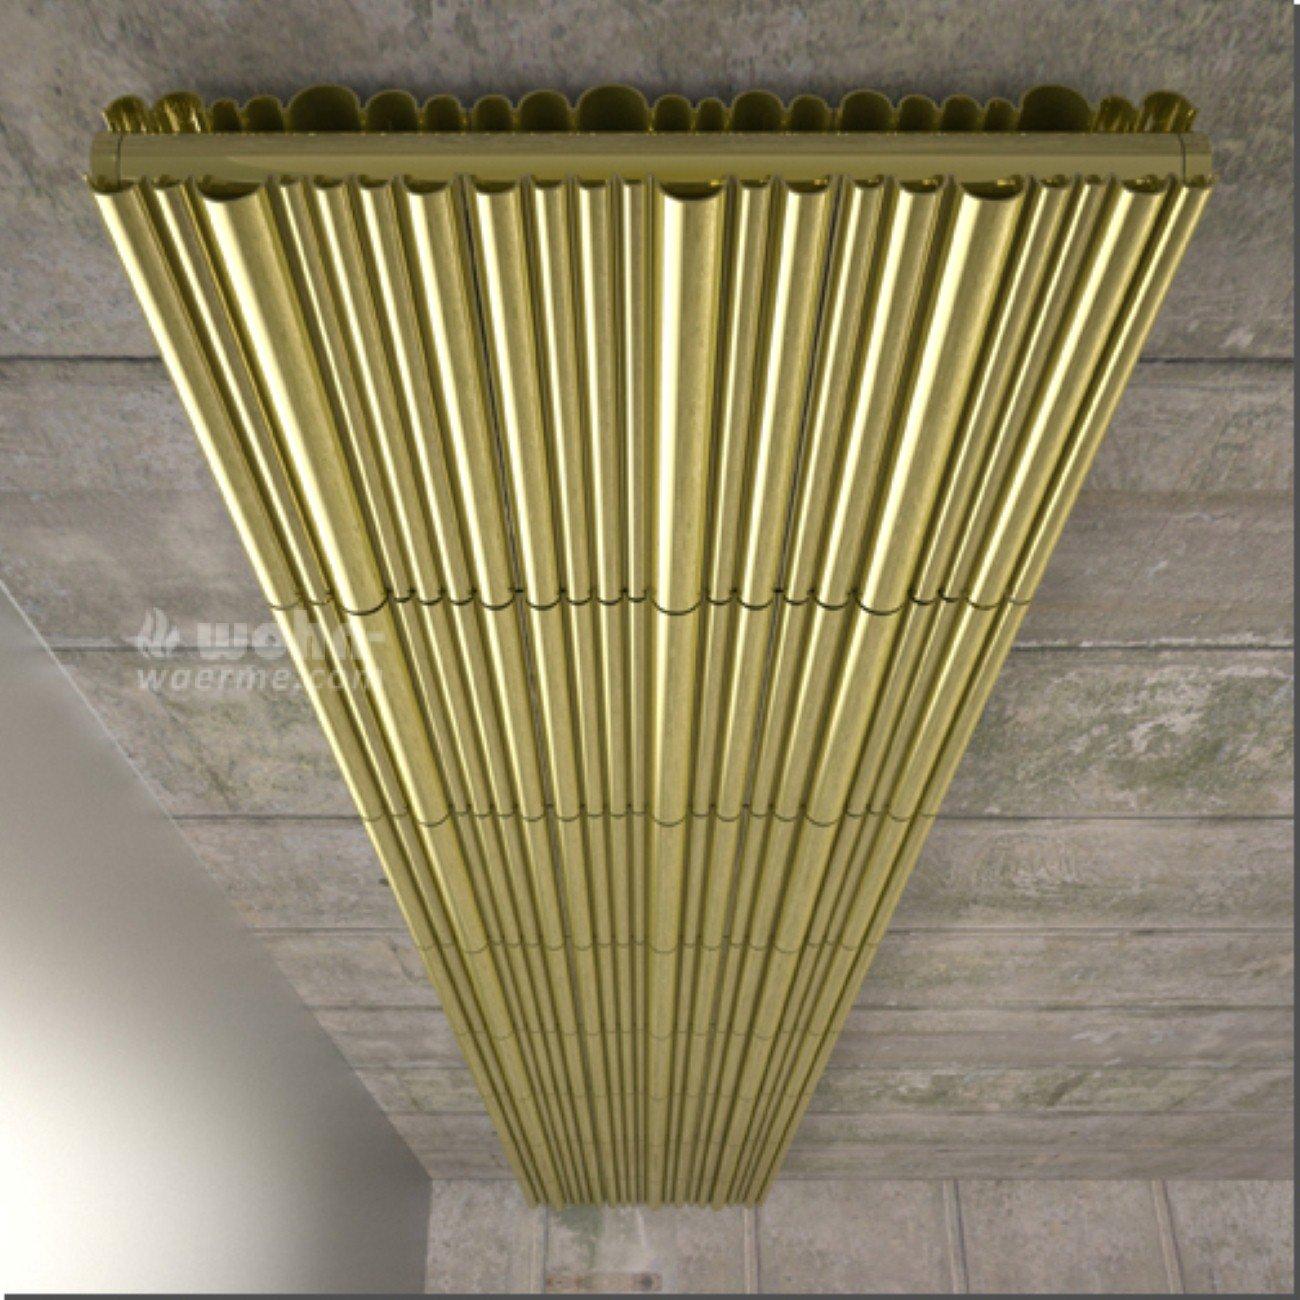 k8 radiatori bamboo design wand heizk rper. Black Bedroom Furniture Sets. Home Design Ideas